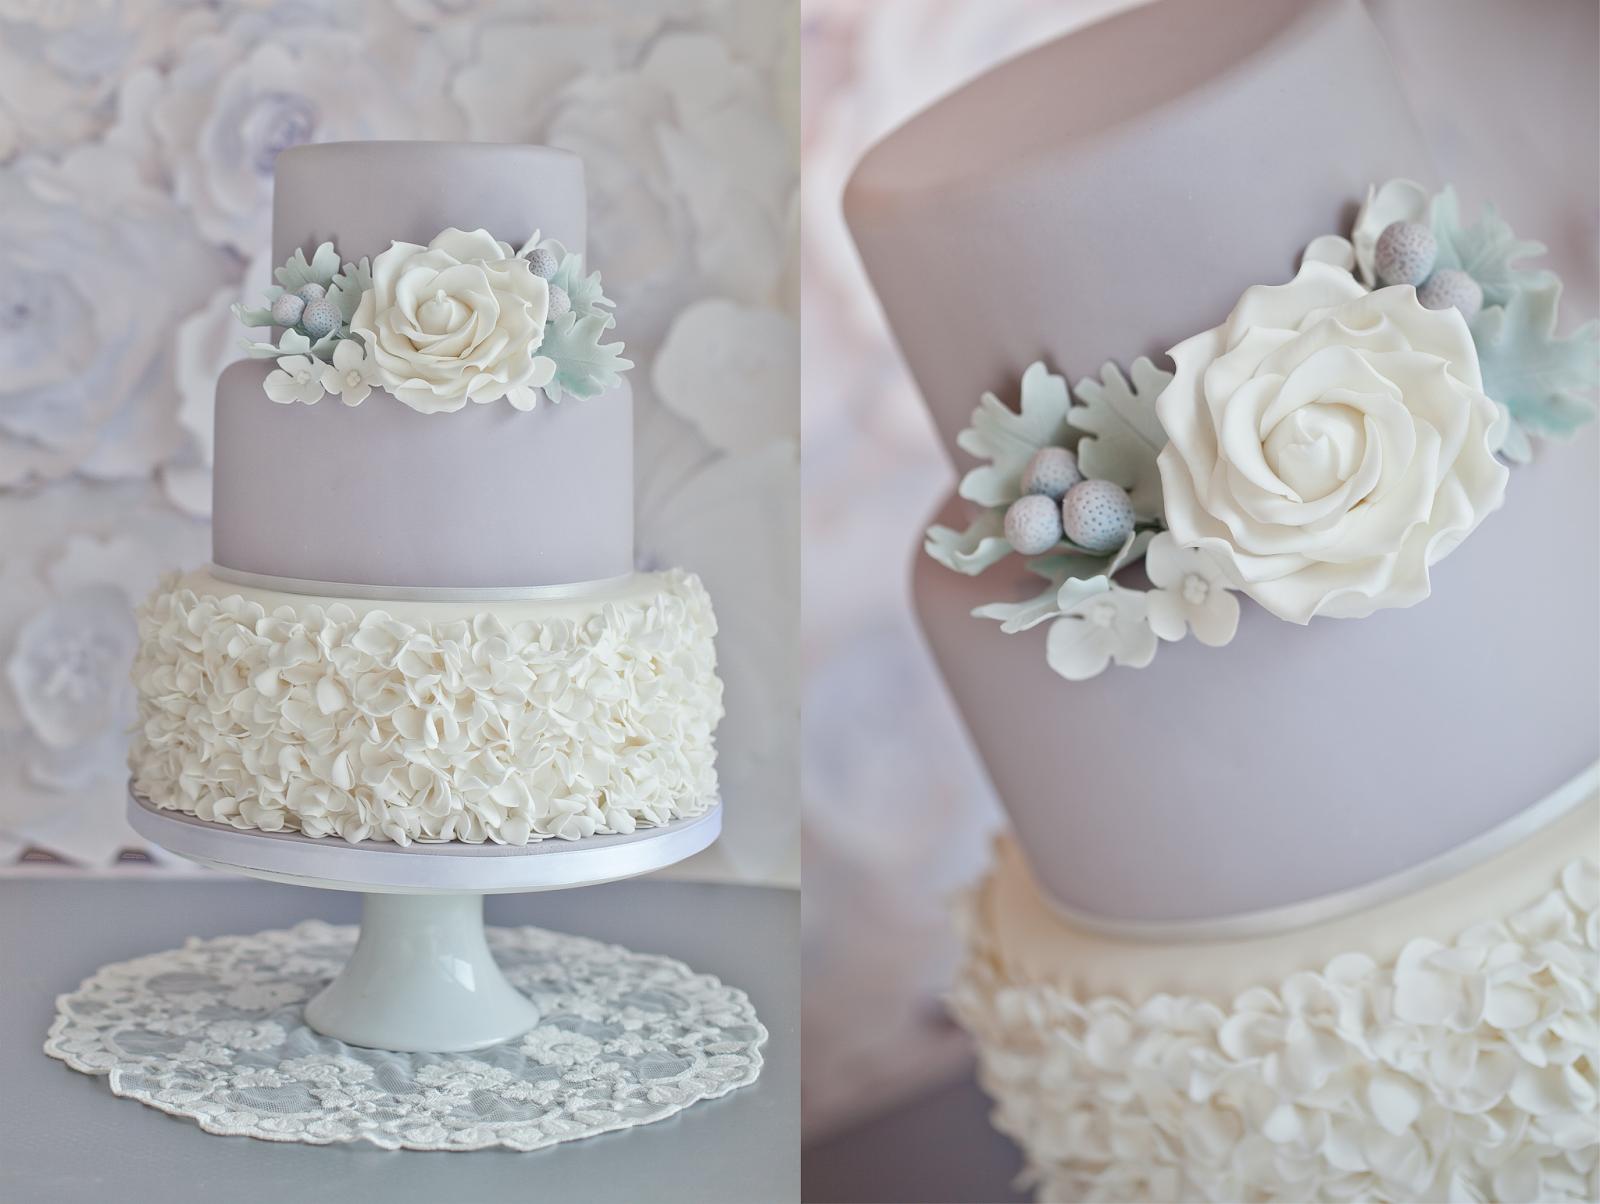 Sugar Ruffles Elegant Wedding Cakes Barrow In Furness And The Lake District Bria